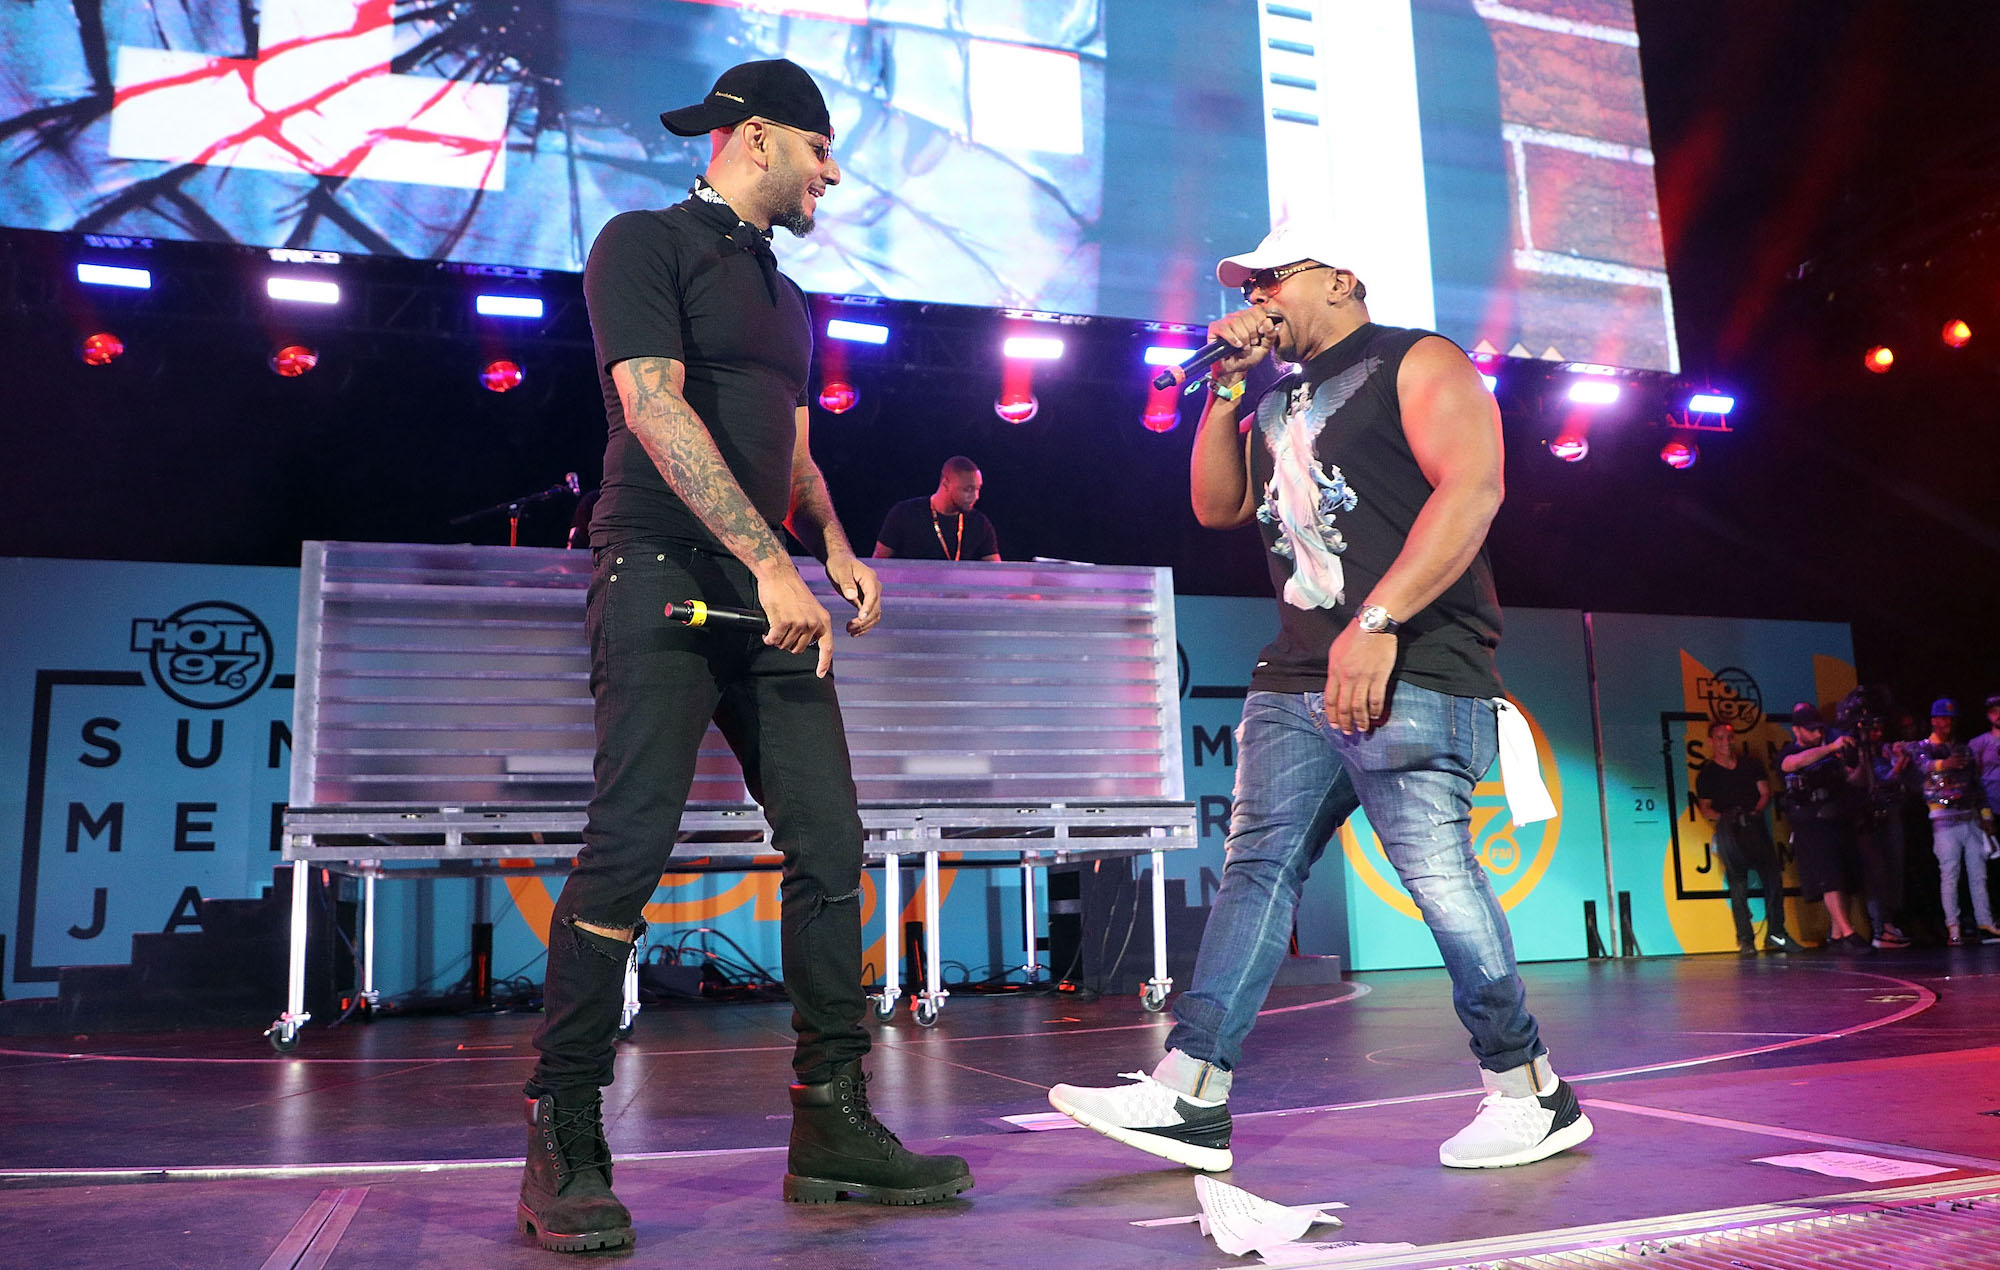 Swizz Beatz and Timbaland dedicate Verzuz rematch to DMX and Aaliyah